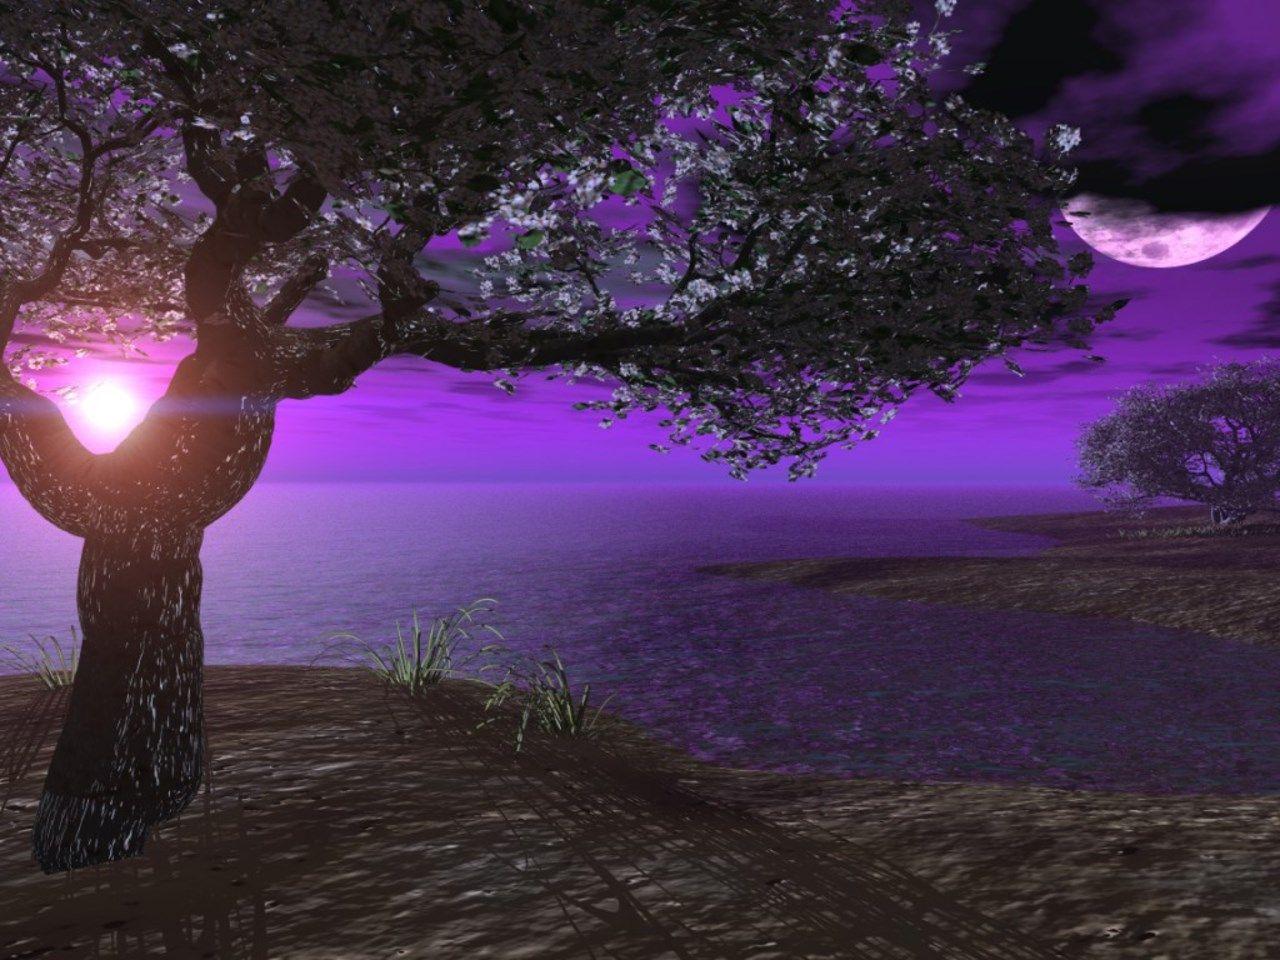 nature | Purple sunset, Moon art, Wallpaper backgrounds